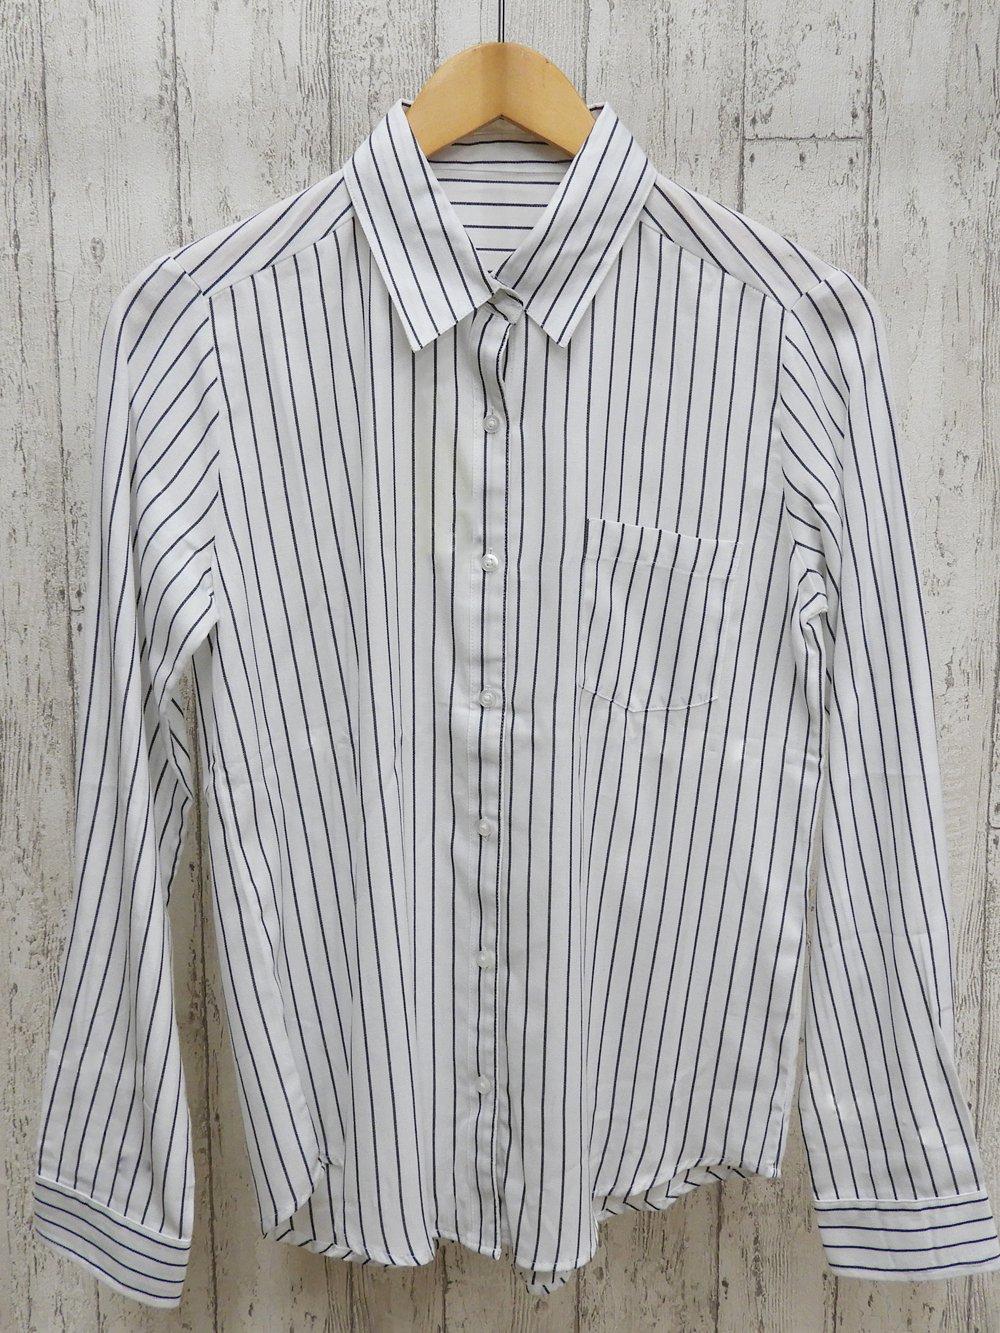 【90%OFF】@299円■5枚セット■ストライプシャツ